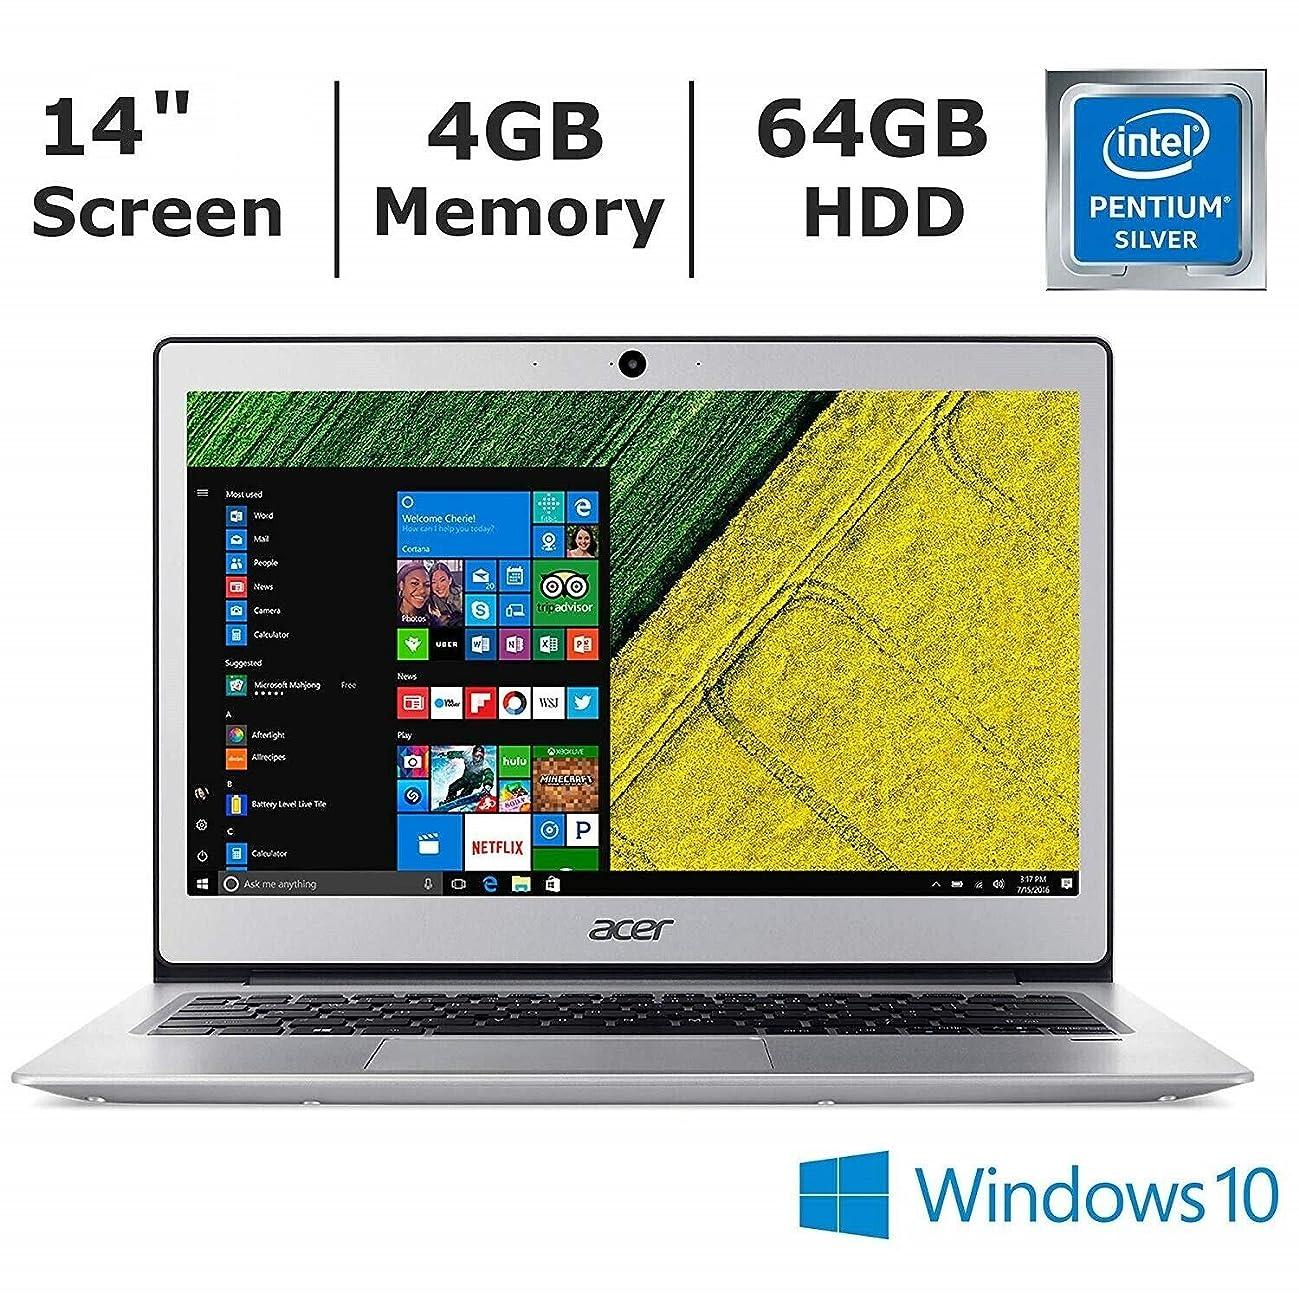 Acer Swift 1 Laptop, 14in Full HD (1920 x 1080), Intel Pentium Silver N5000 Quad-Core, 4GB RAM, 64GB Flash Memory Internal Storage, Windows 10 Home (Renewed)